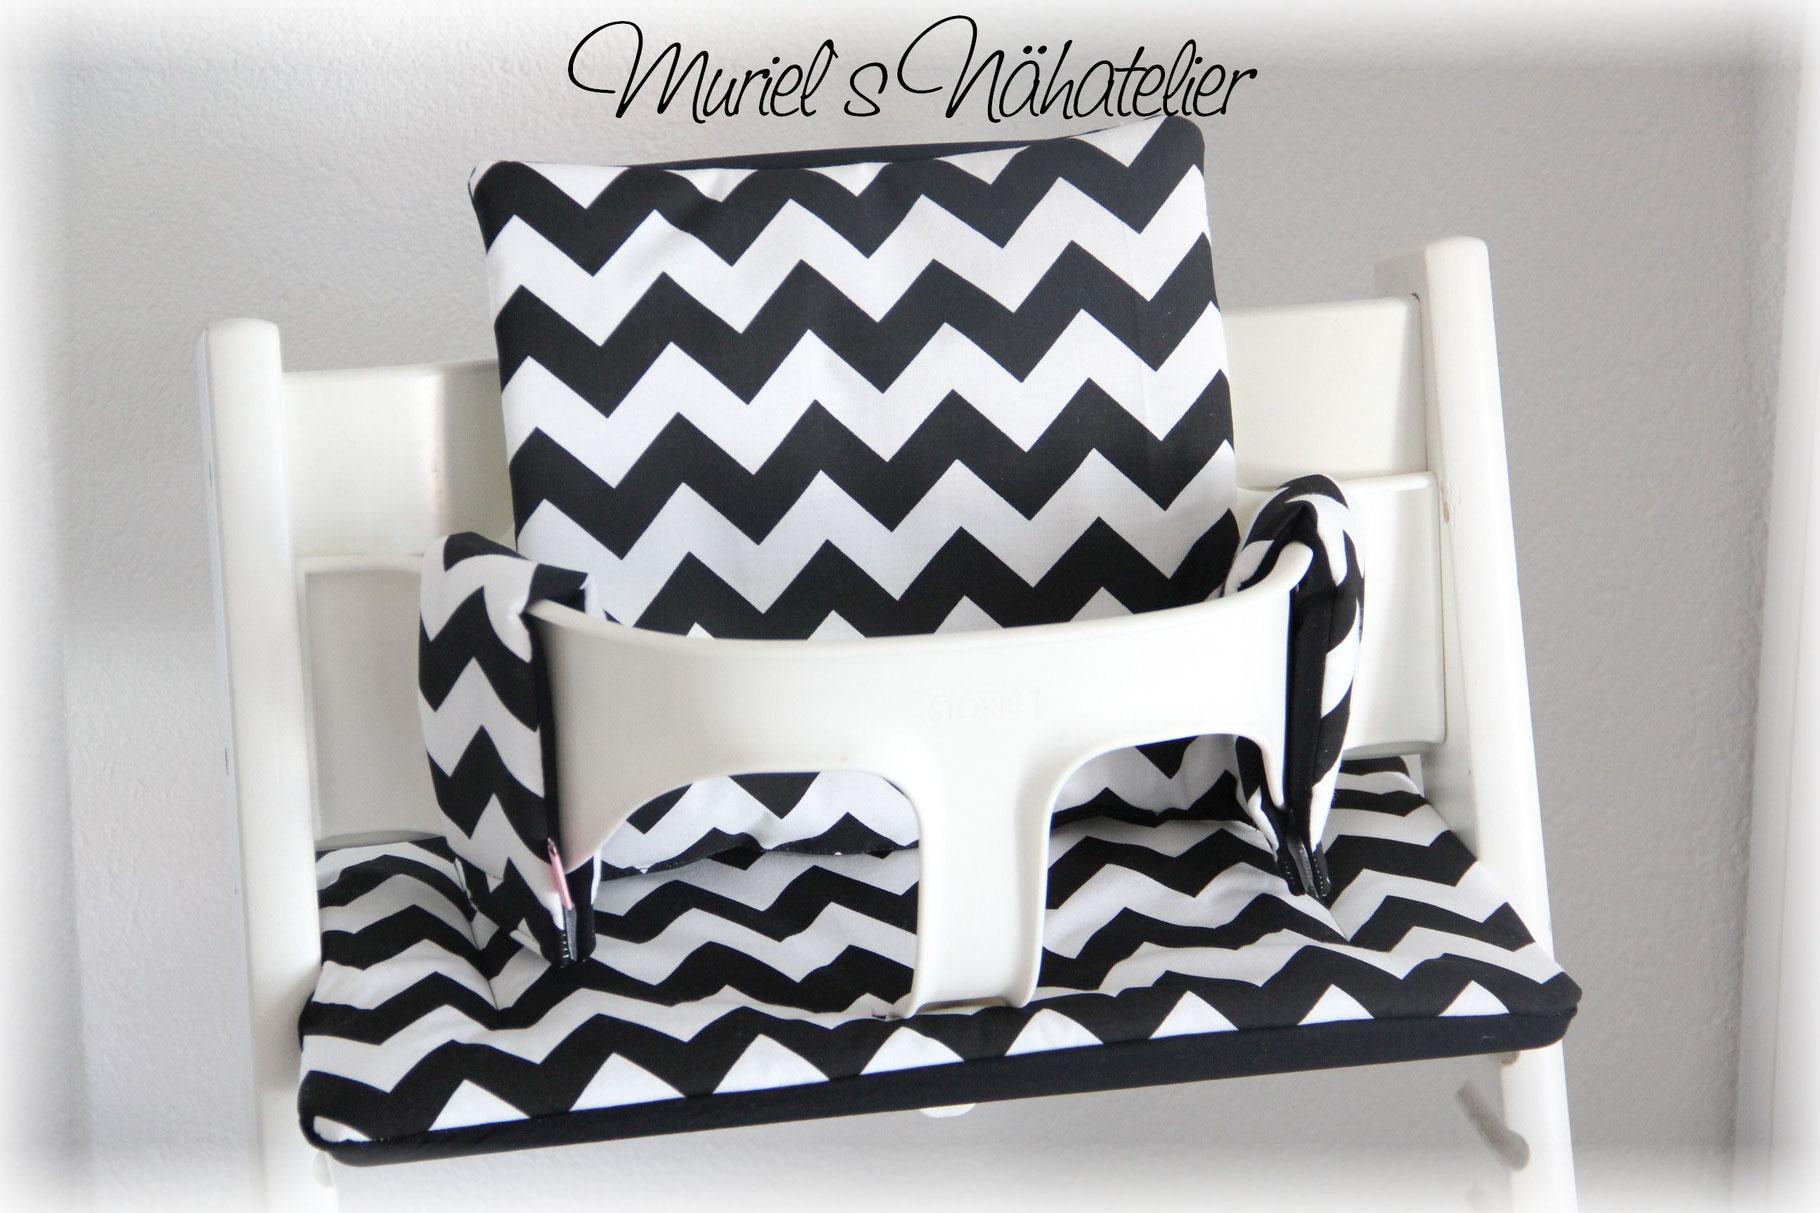 tripp trapp kissen sonstige muriels n hatelier. Black Bedroom Furniture Sets. Home Design Ideas